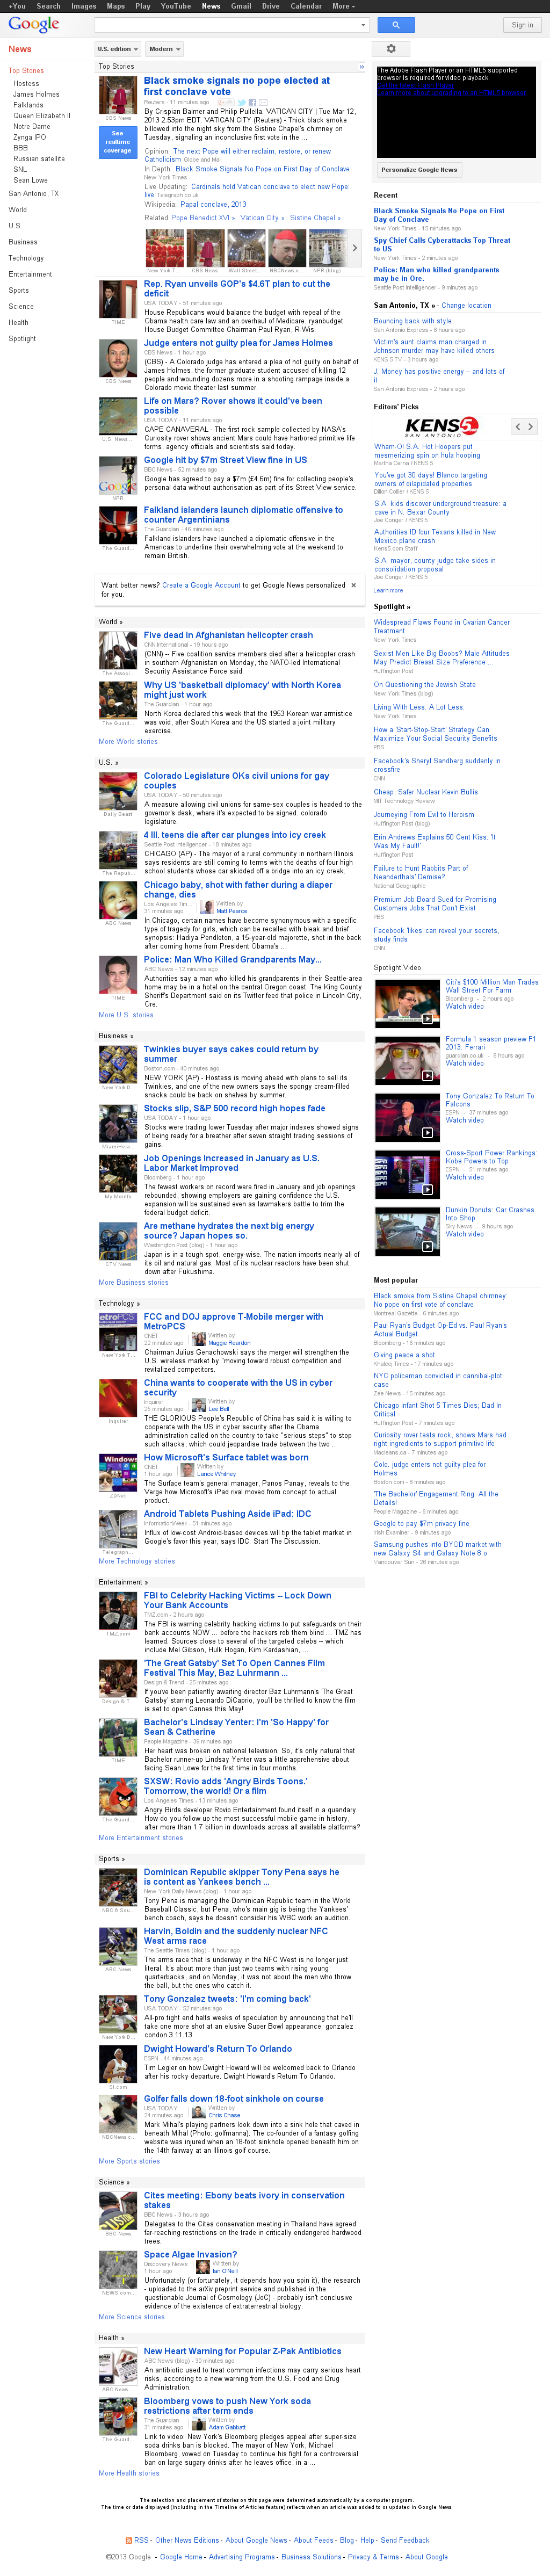 Google News at Tuesday March 12, 2013, 7:07 p.m. UTC